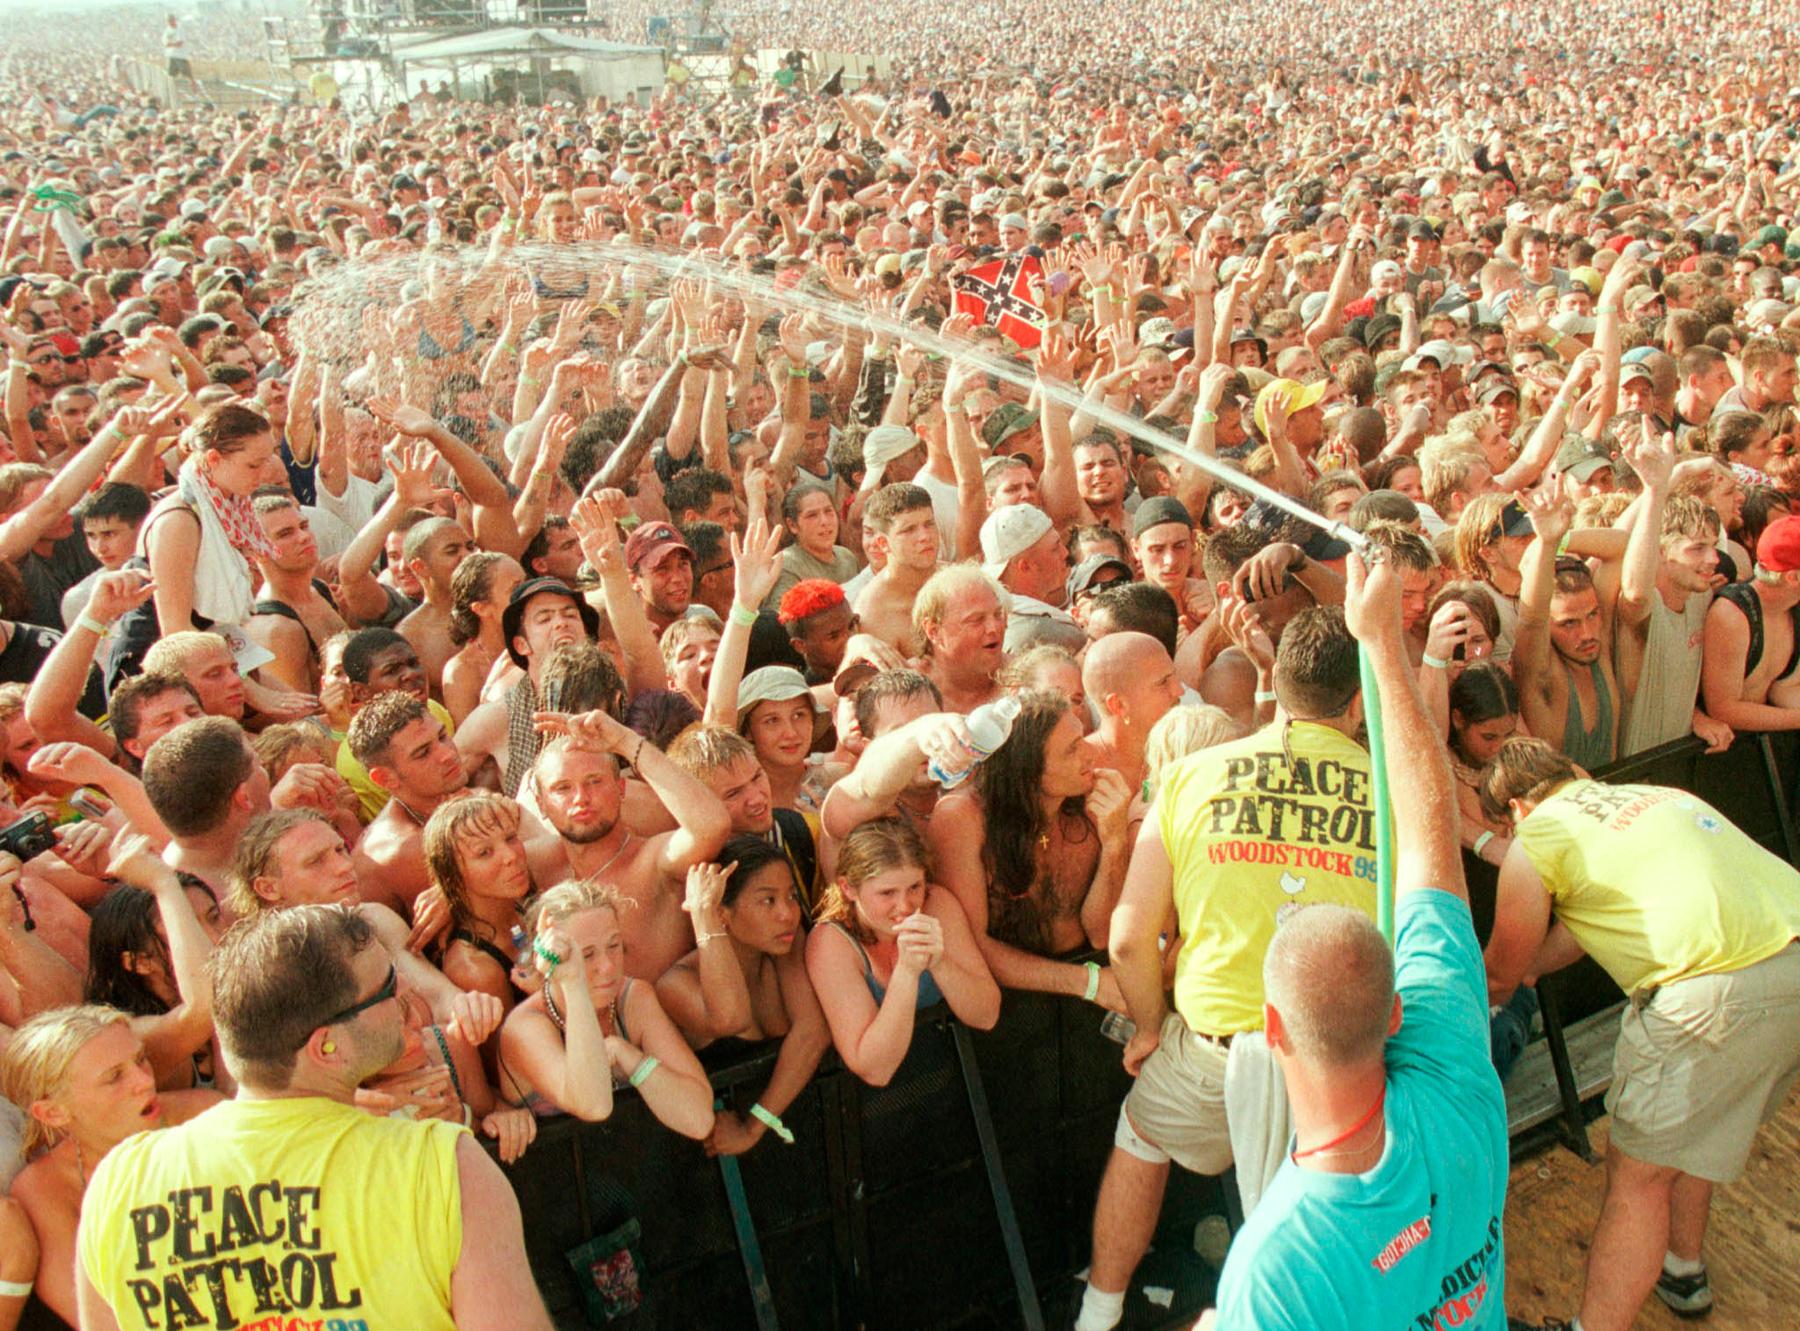 Woodstock 99: Rage Against the Latrine - Rolling Stone